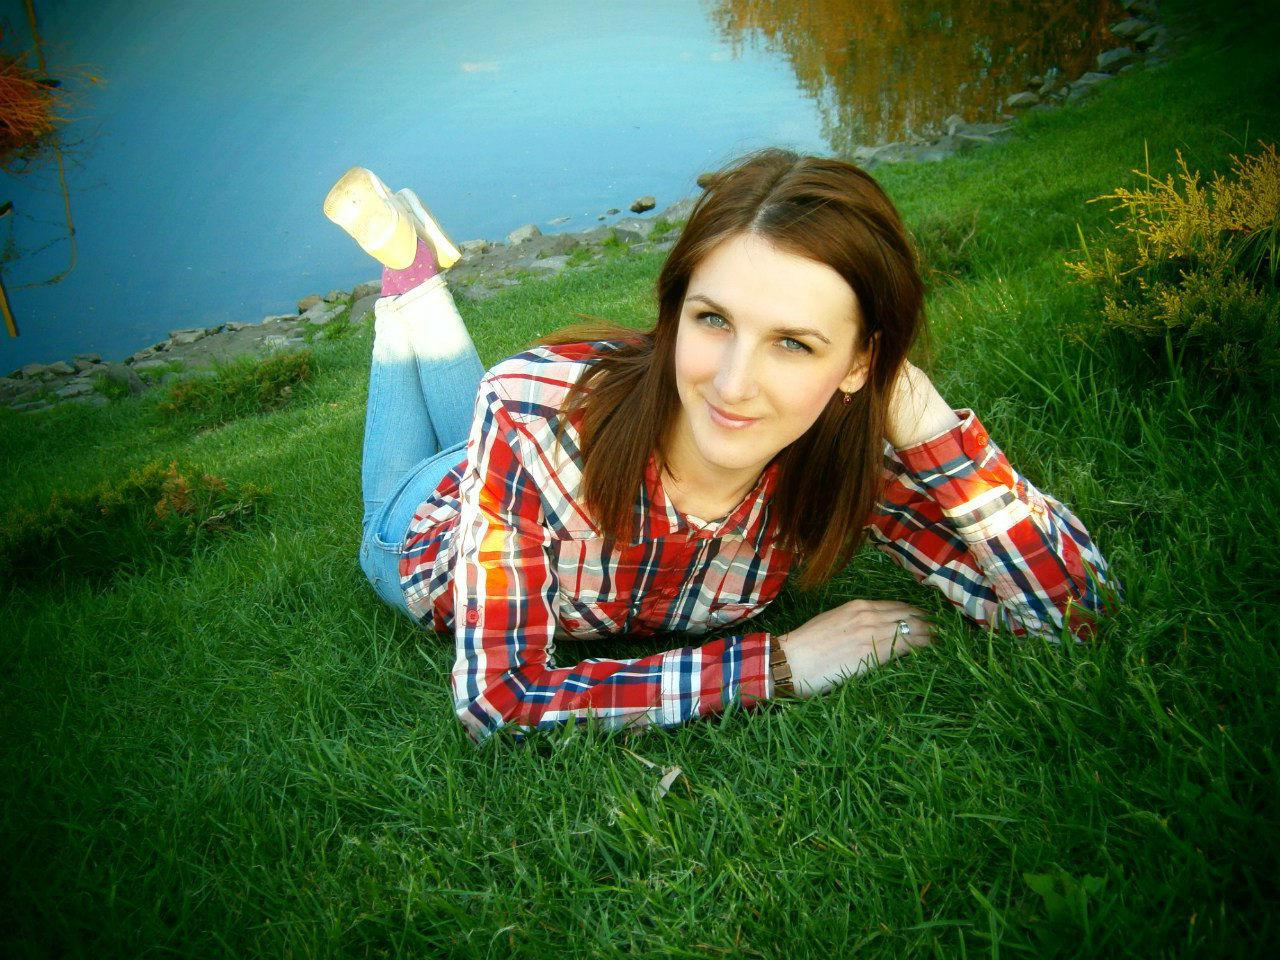 Юная девушка шатенка на берегу реки в джинсах